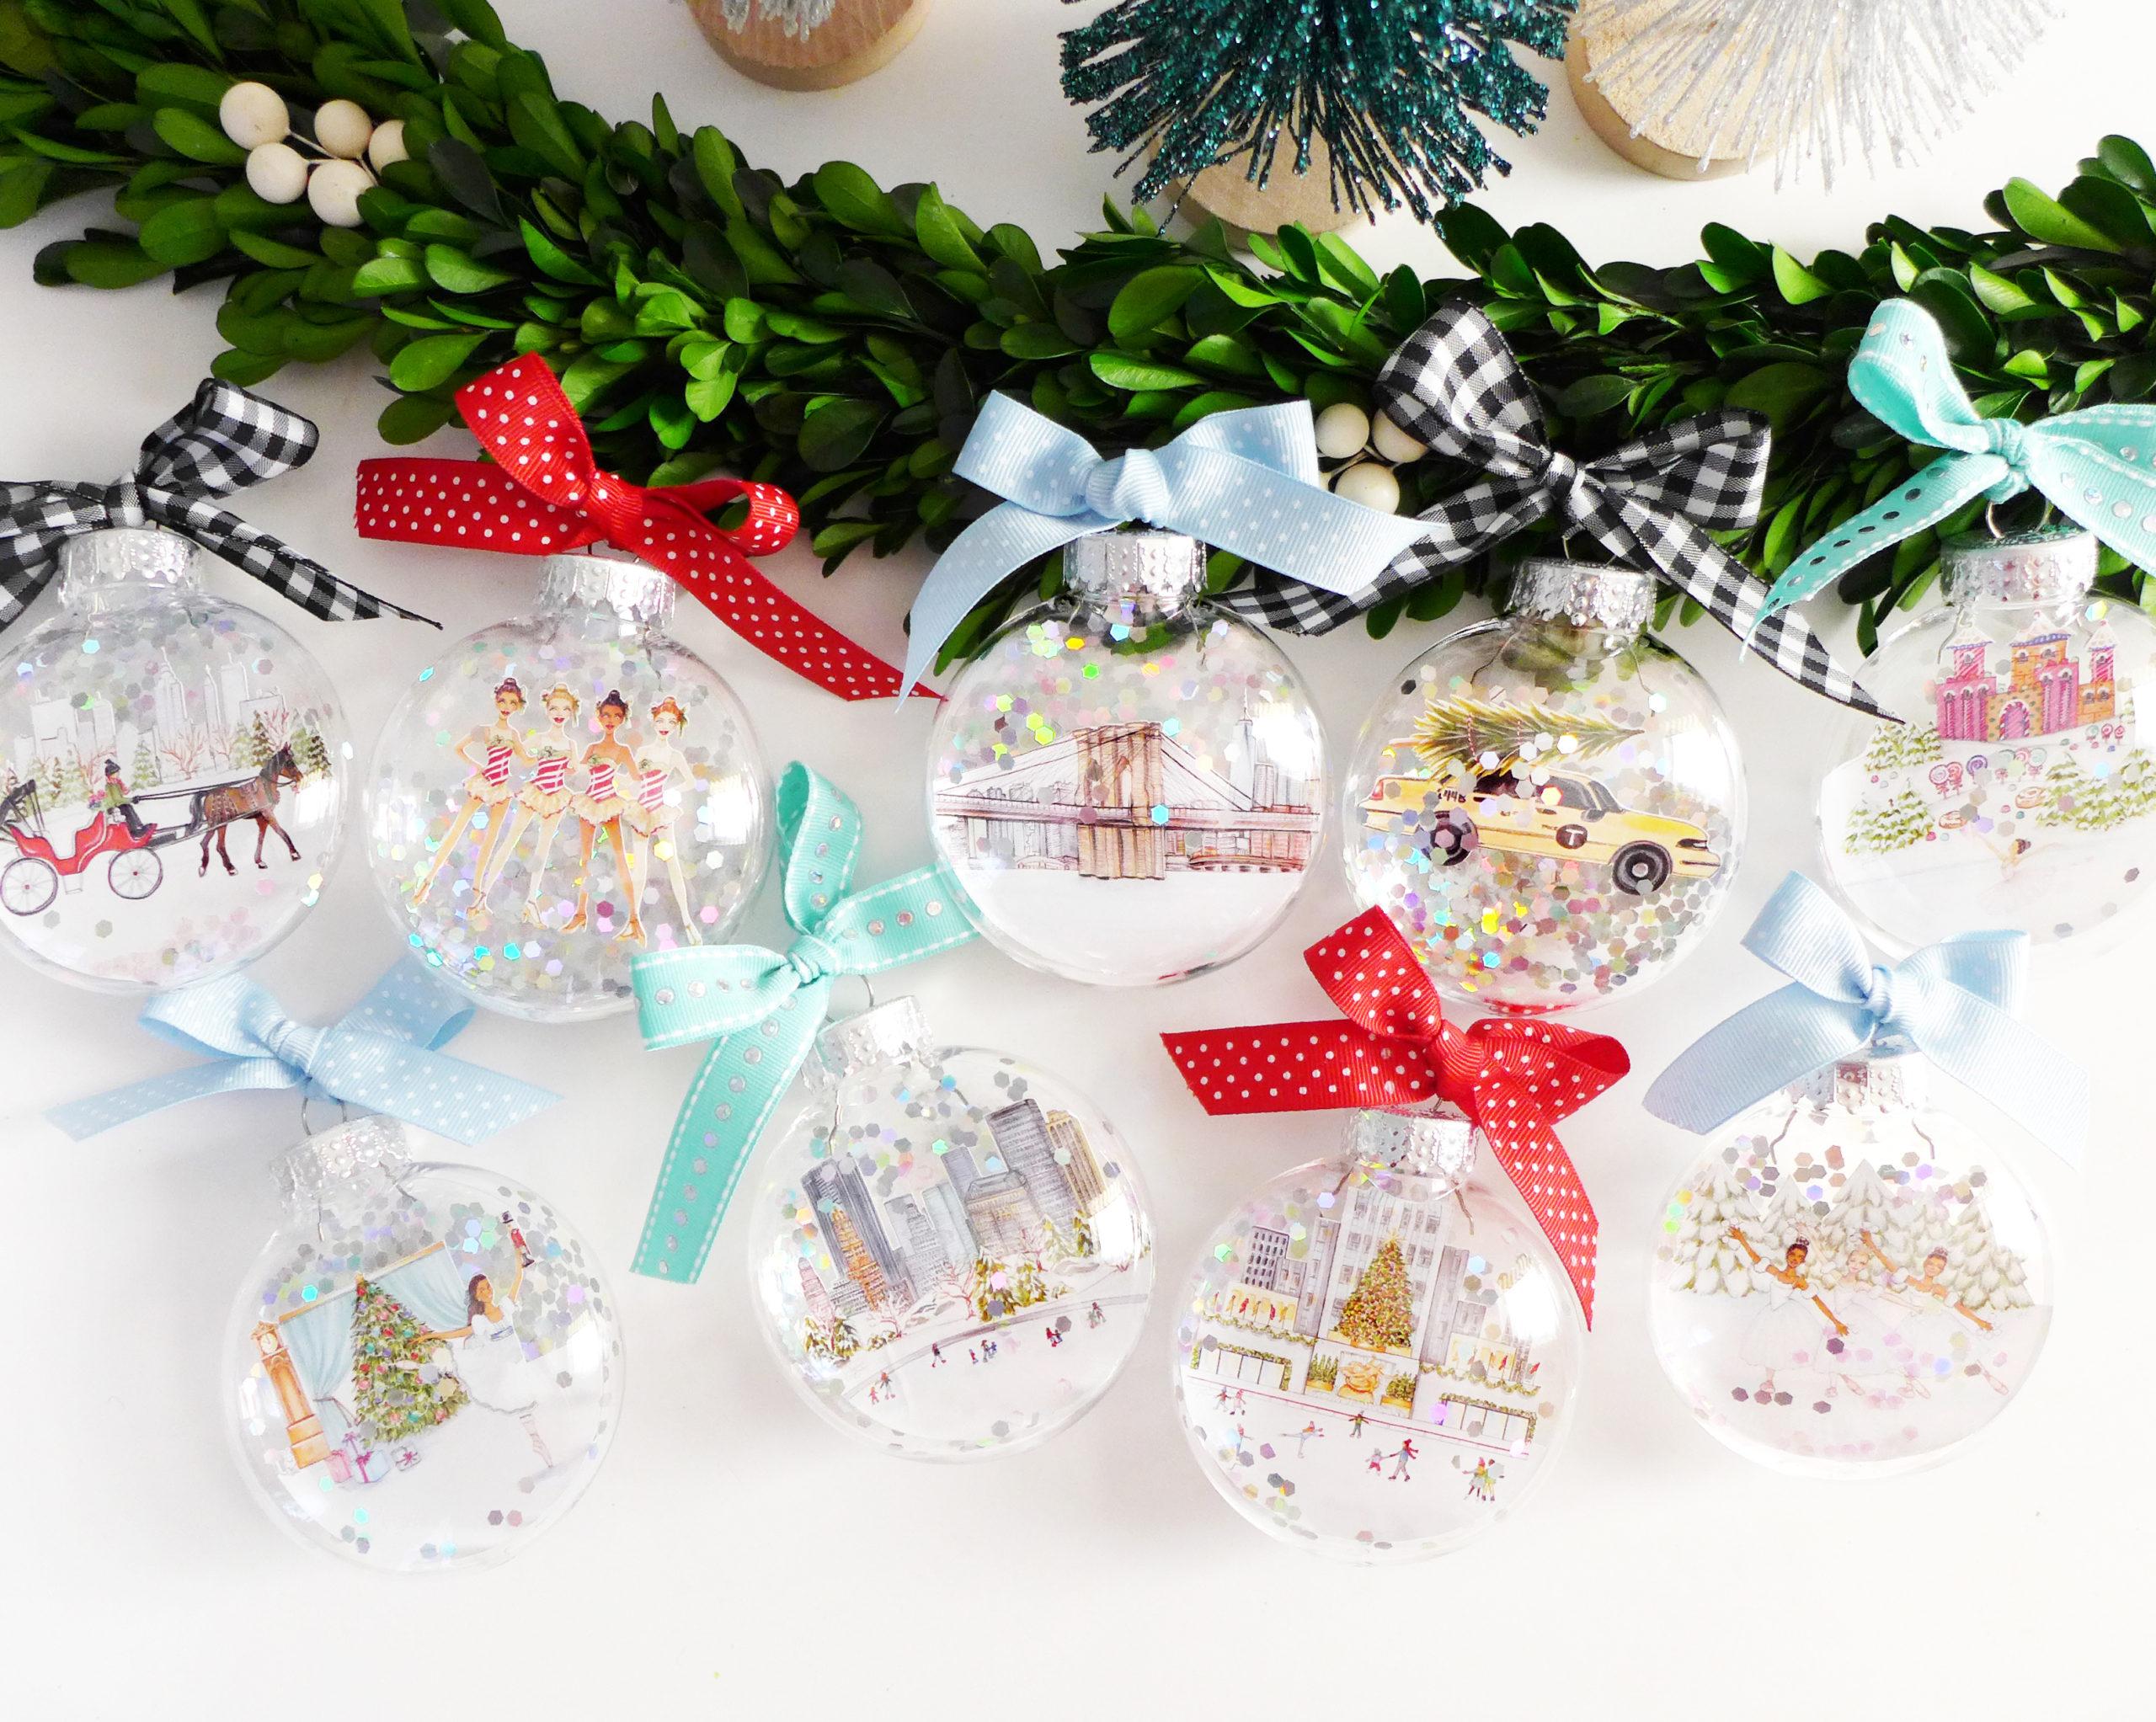 Illustrated Glitter Ornaments by Joanna Baker